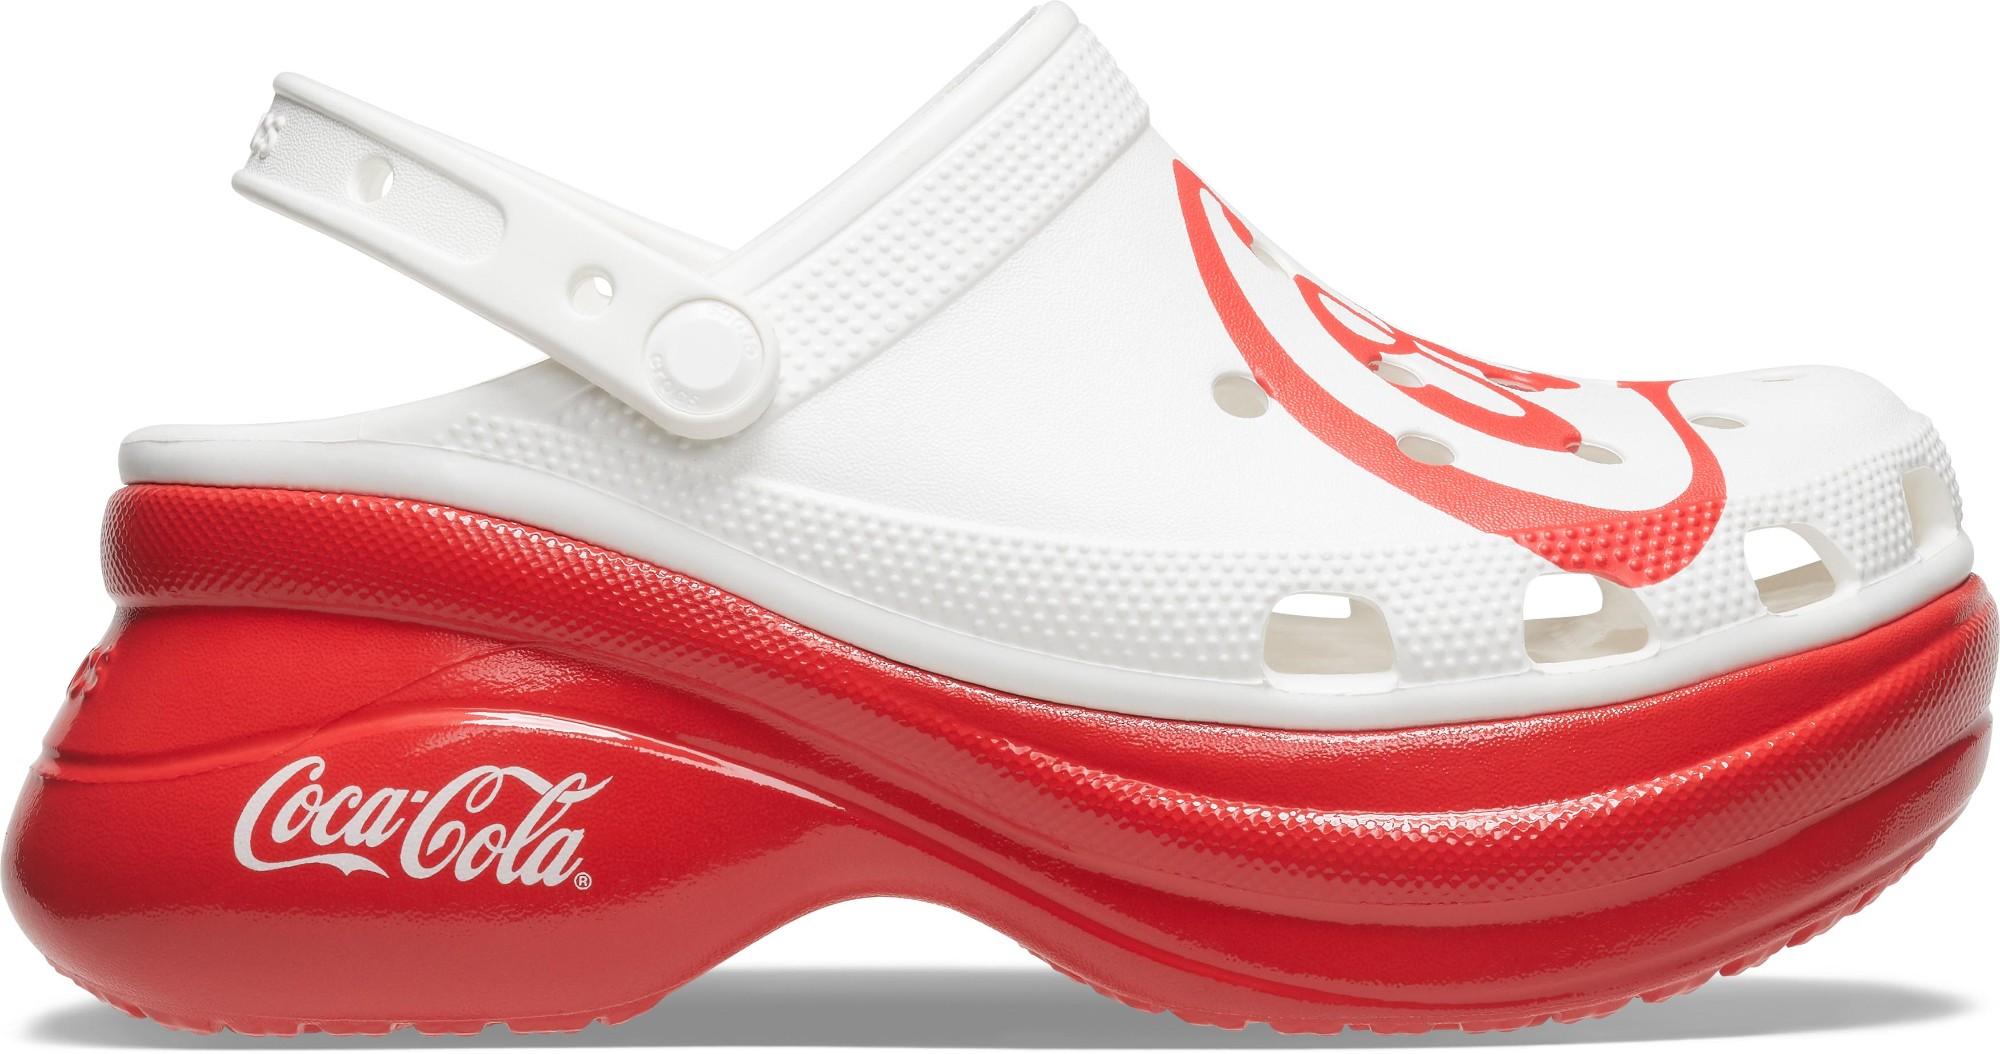 Crocs™ Coca-Cola X Classic Bae Clog Women's White/Red 36,5